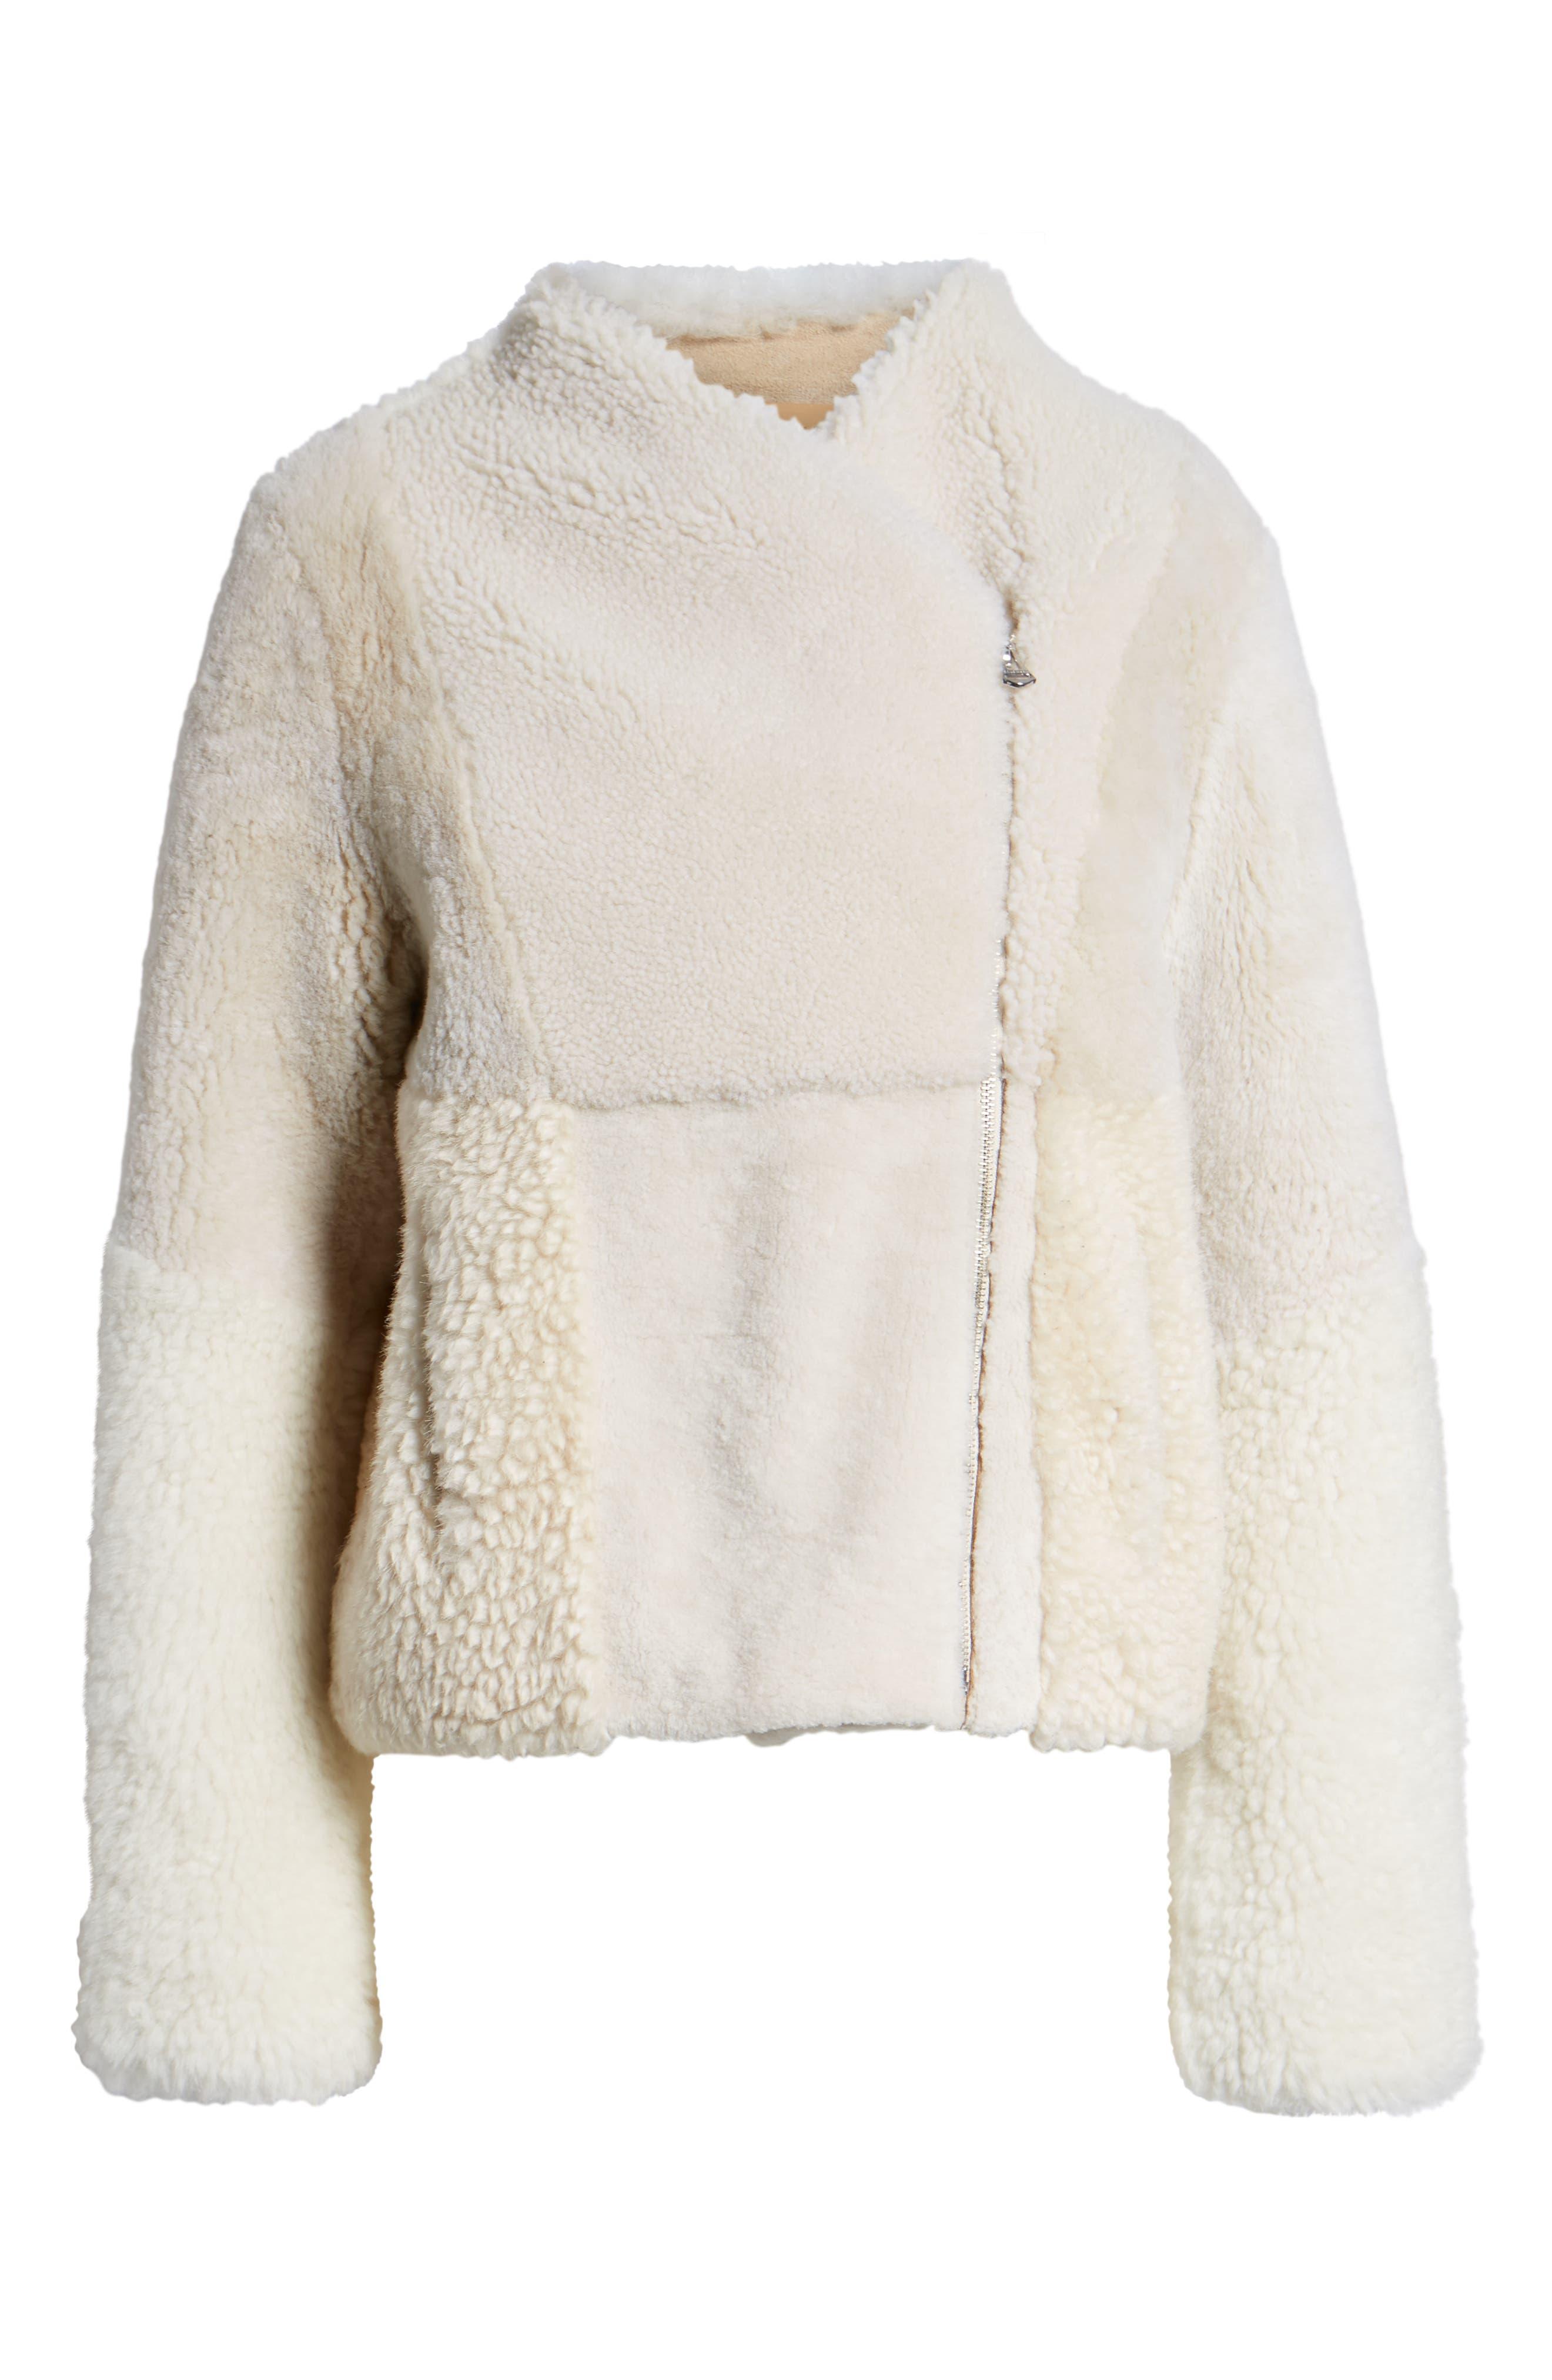 Patchwork Genuine Shearling Jacket,                             Alternate thumbnail 6, color,                             CREAM